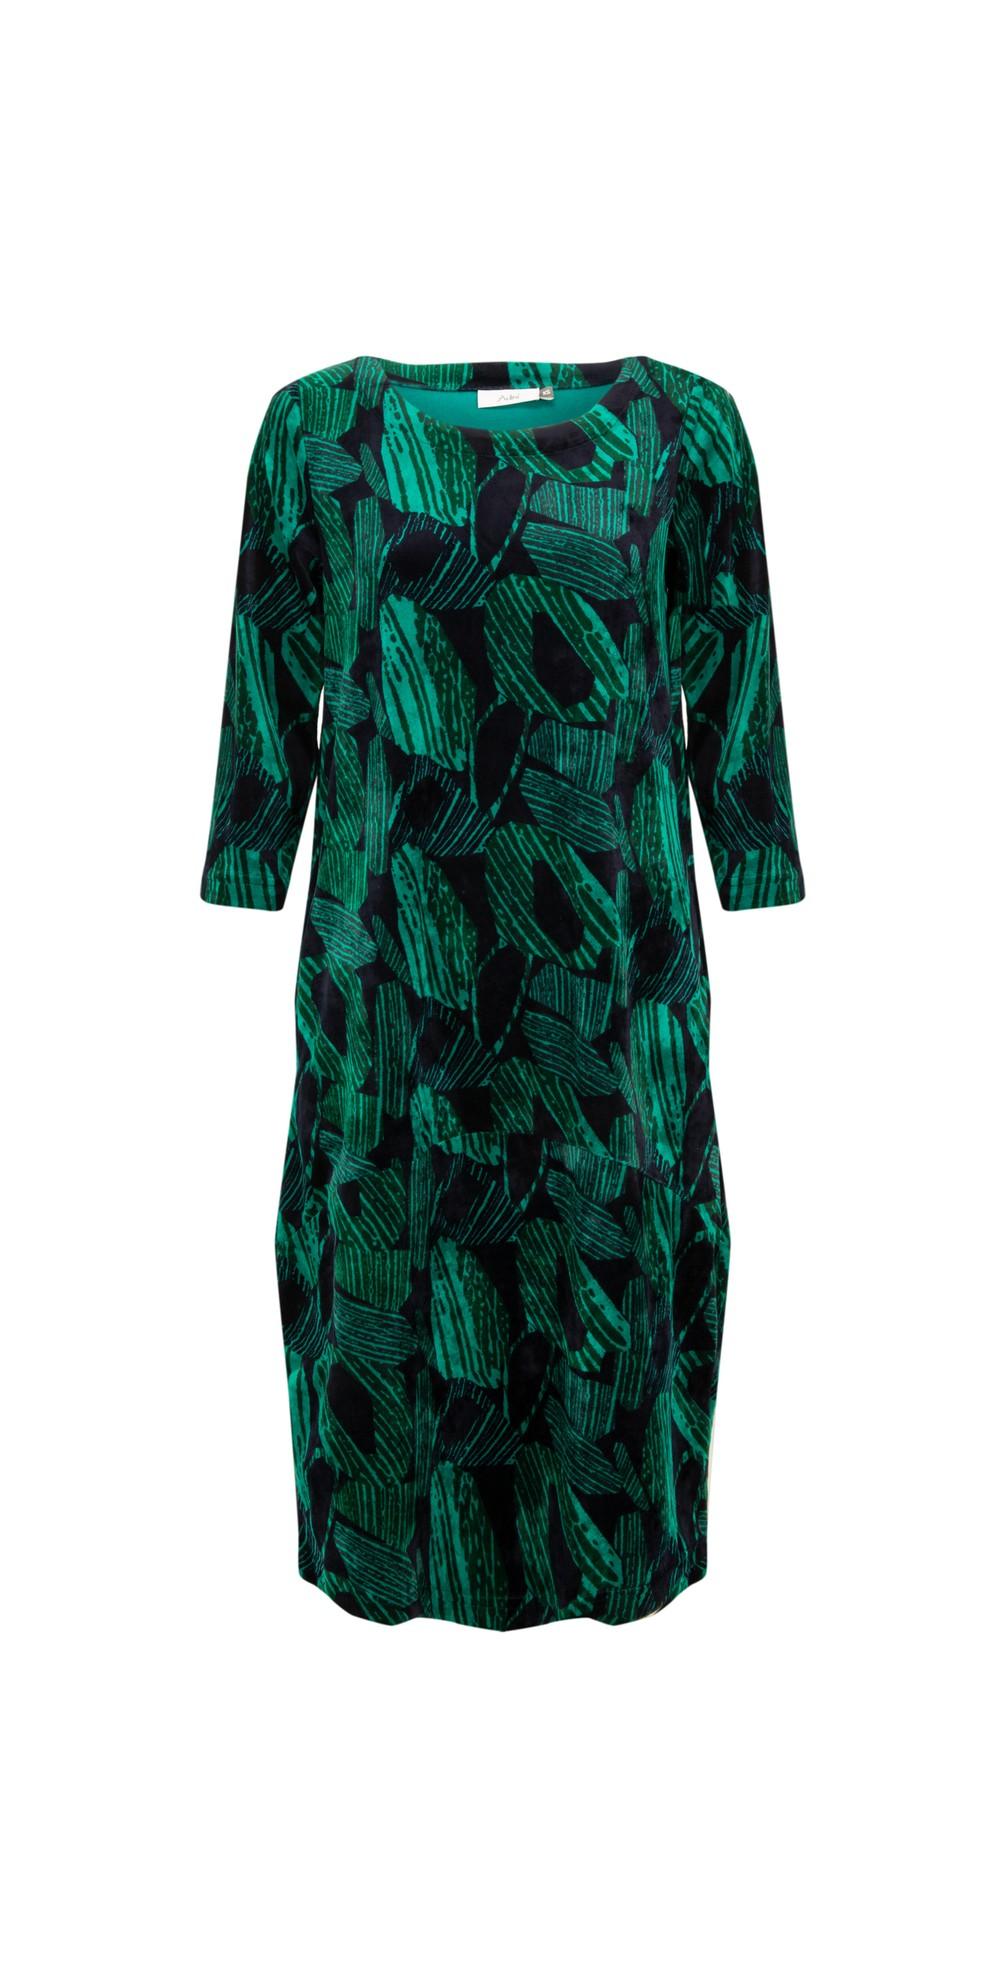 Elodie Velour Dress main image